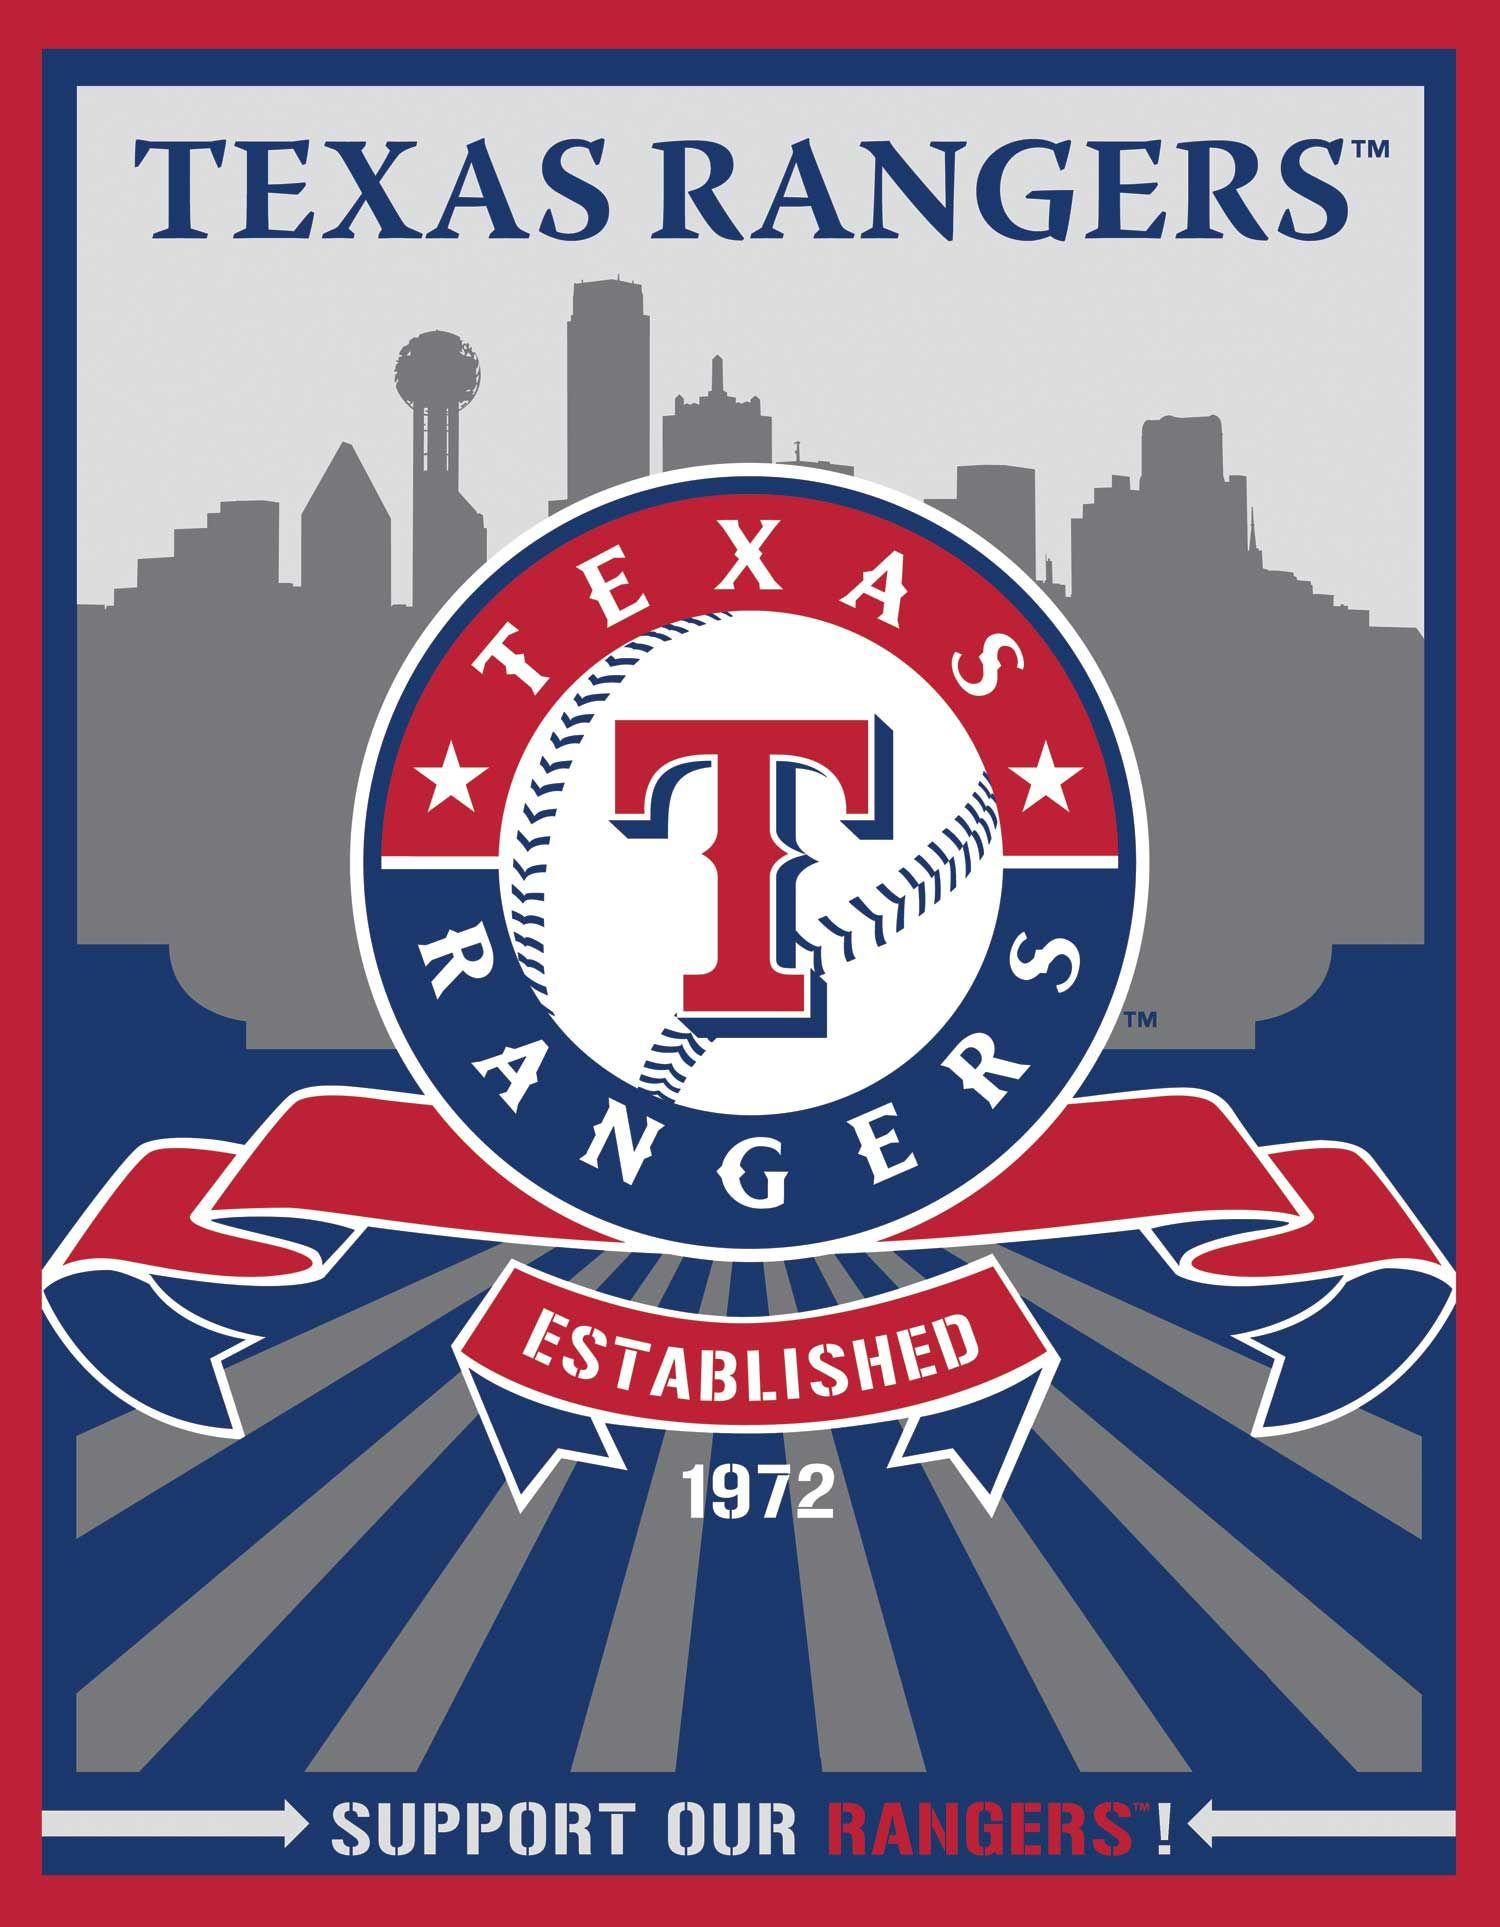 Texas Rangers Speakman Art Target Mlb Texas Rangers Texas Rangers Baseball Texas Baseball